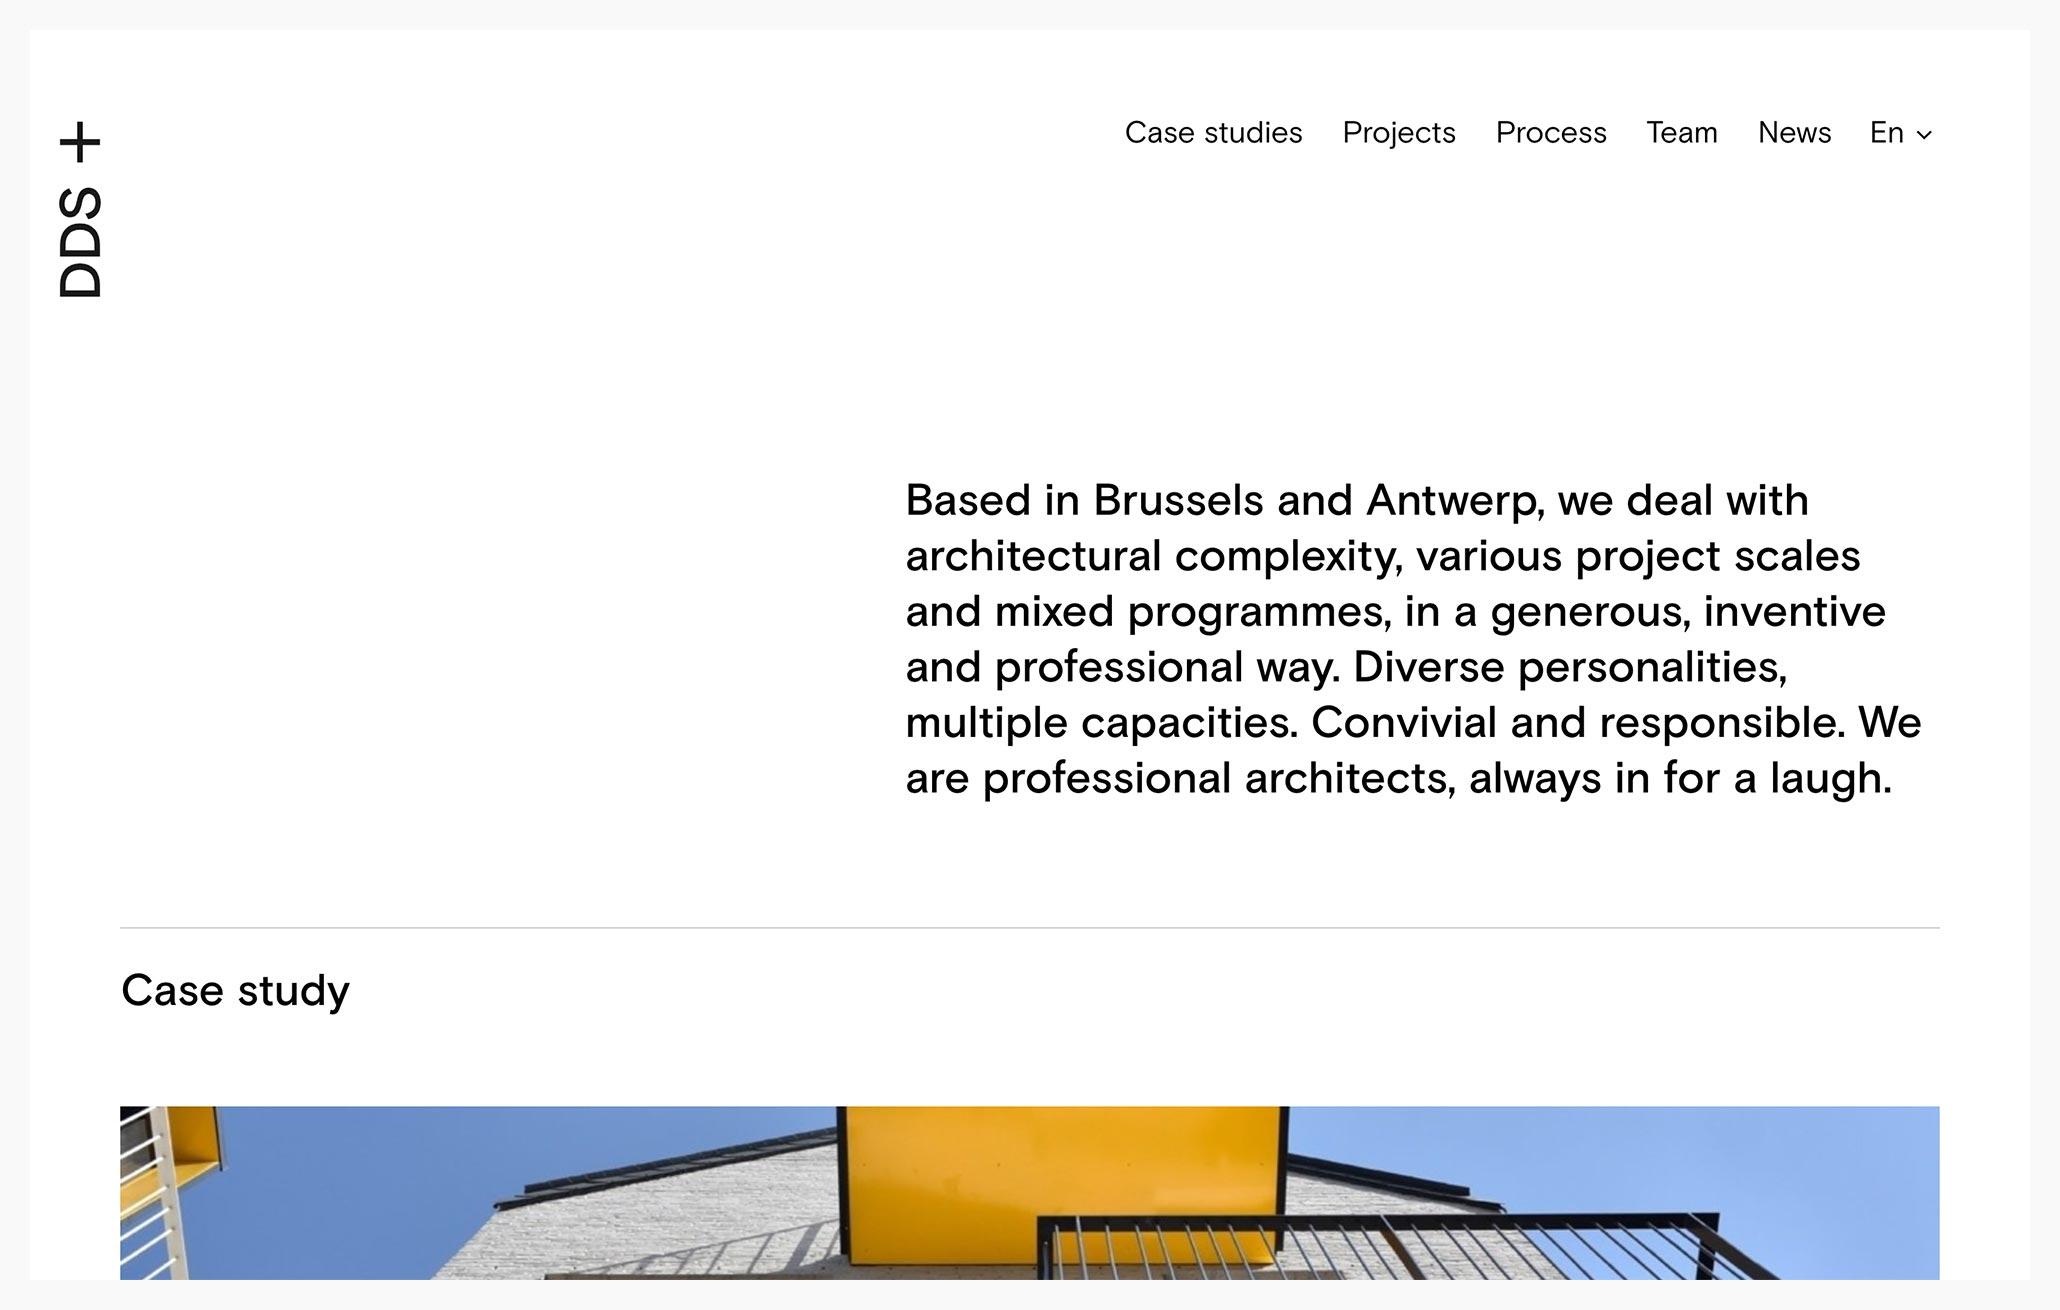 DDS+ - Best Architecture Website of 2019